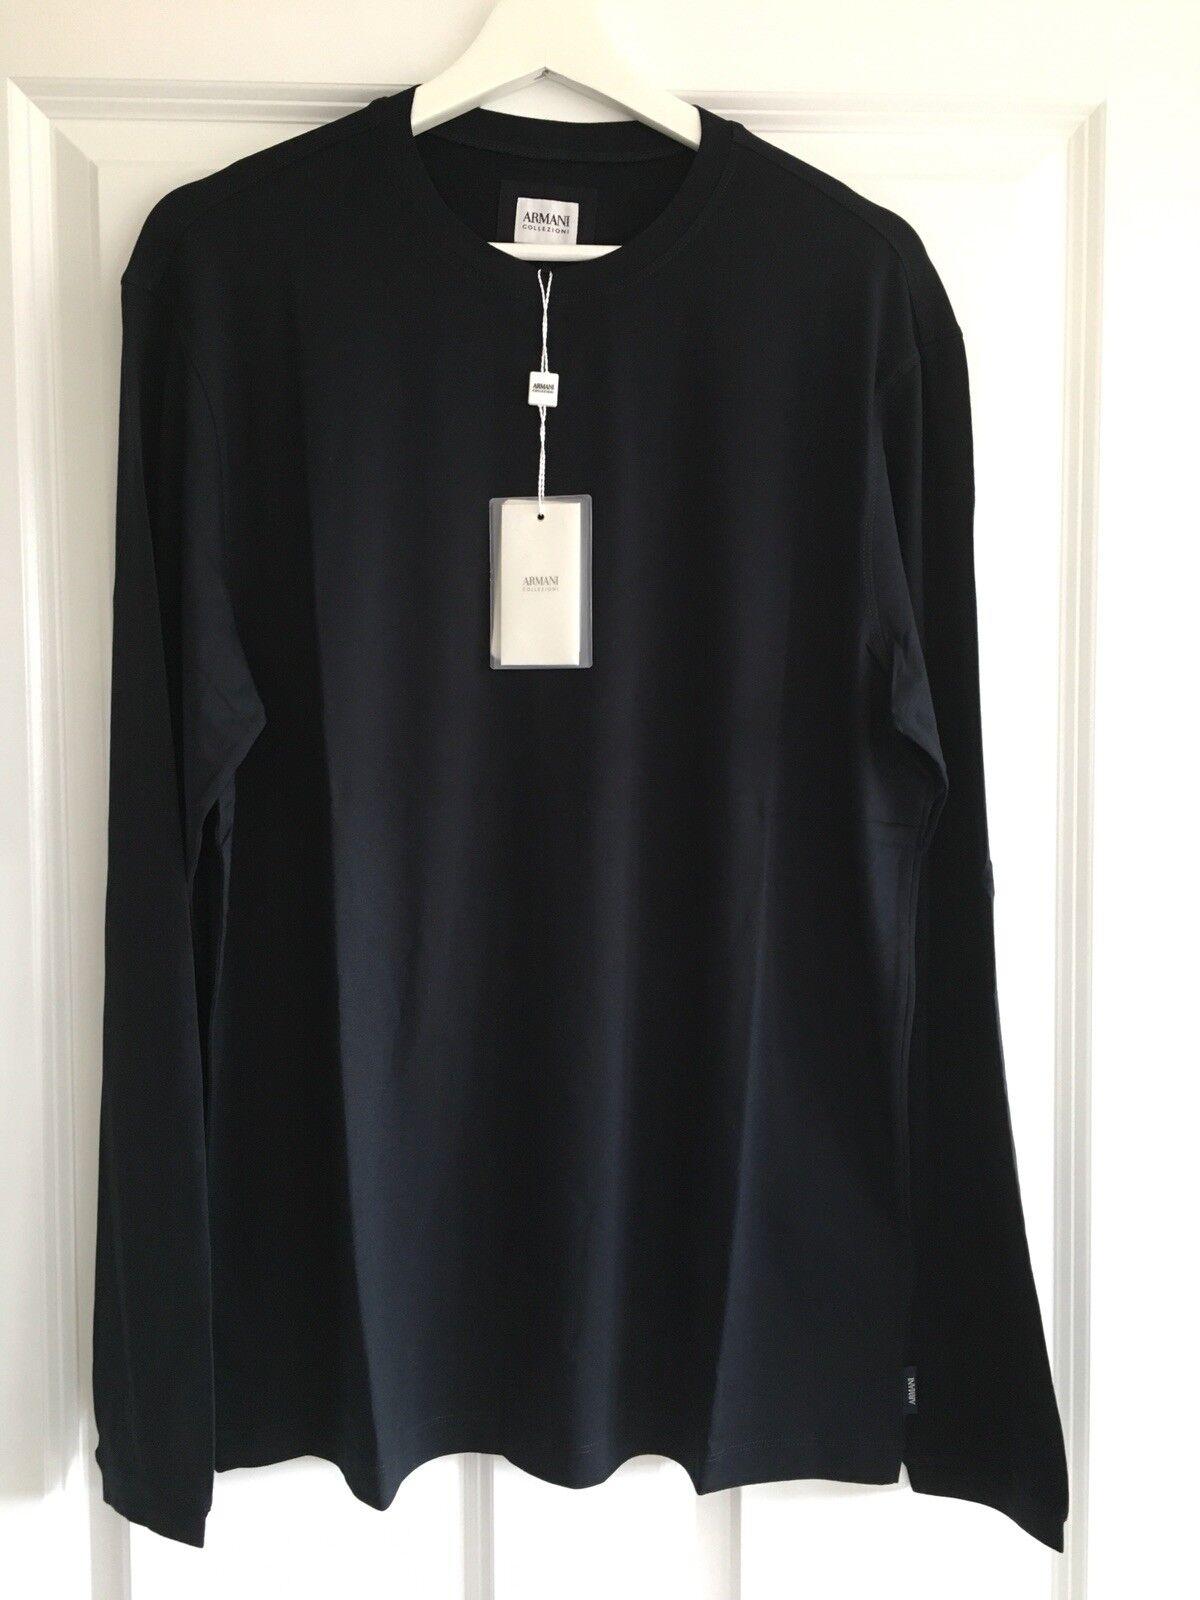 Armani collezioni mens Long Sleeve T-shirt XXL